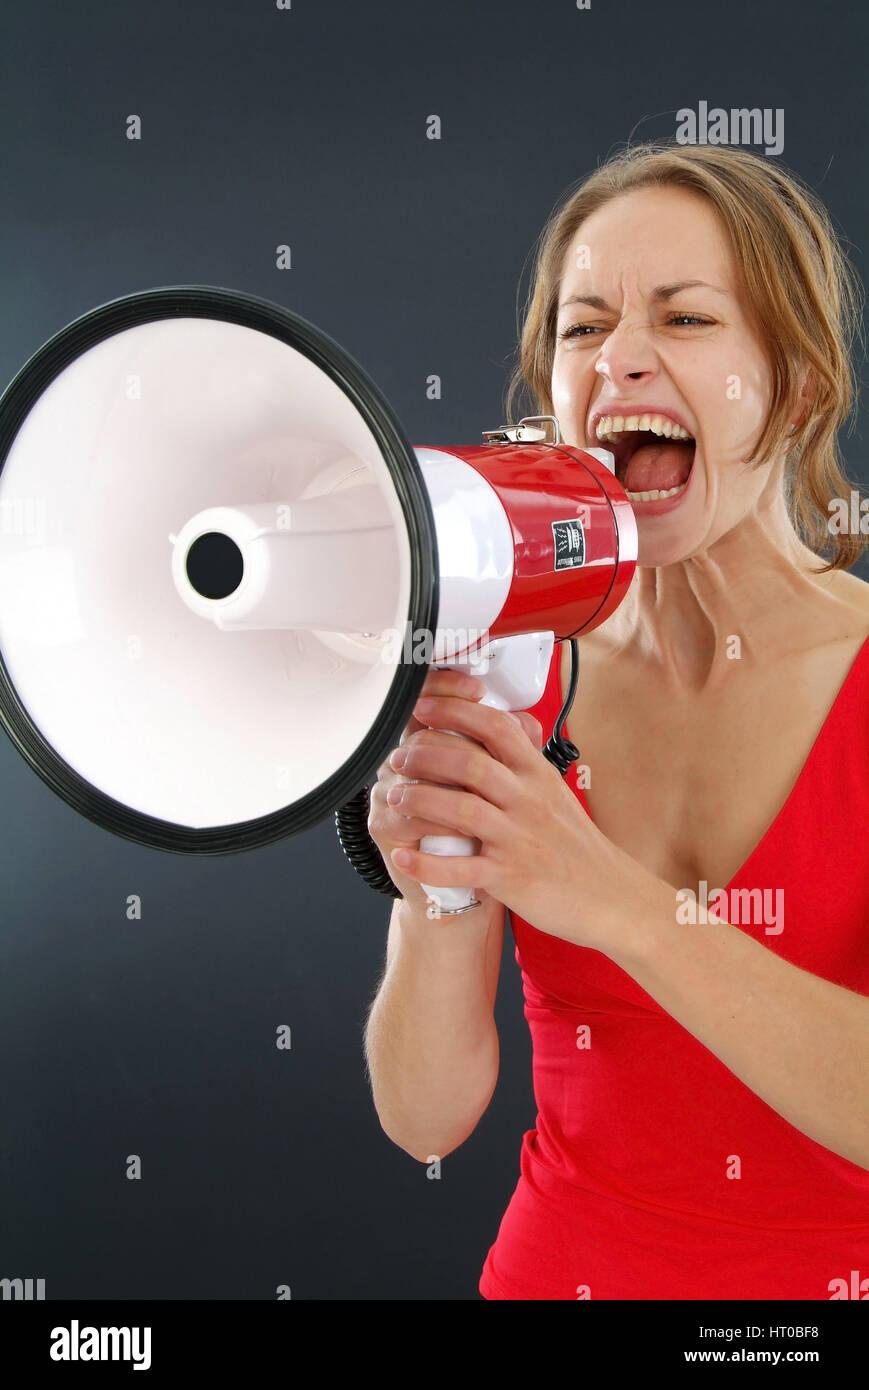 Junge Frau schreit in ein Megaphon - young woman screaming in a megaphone Stock Photo